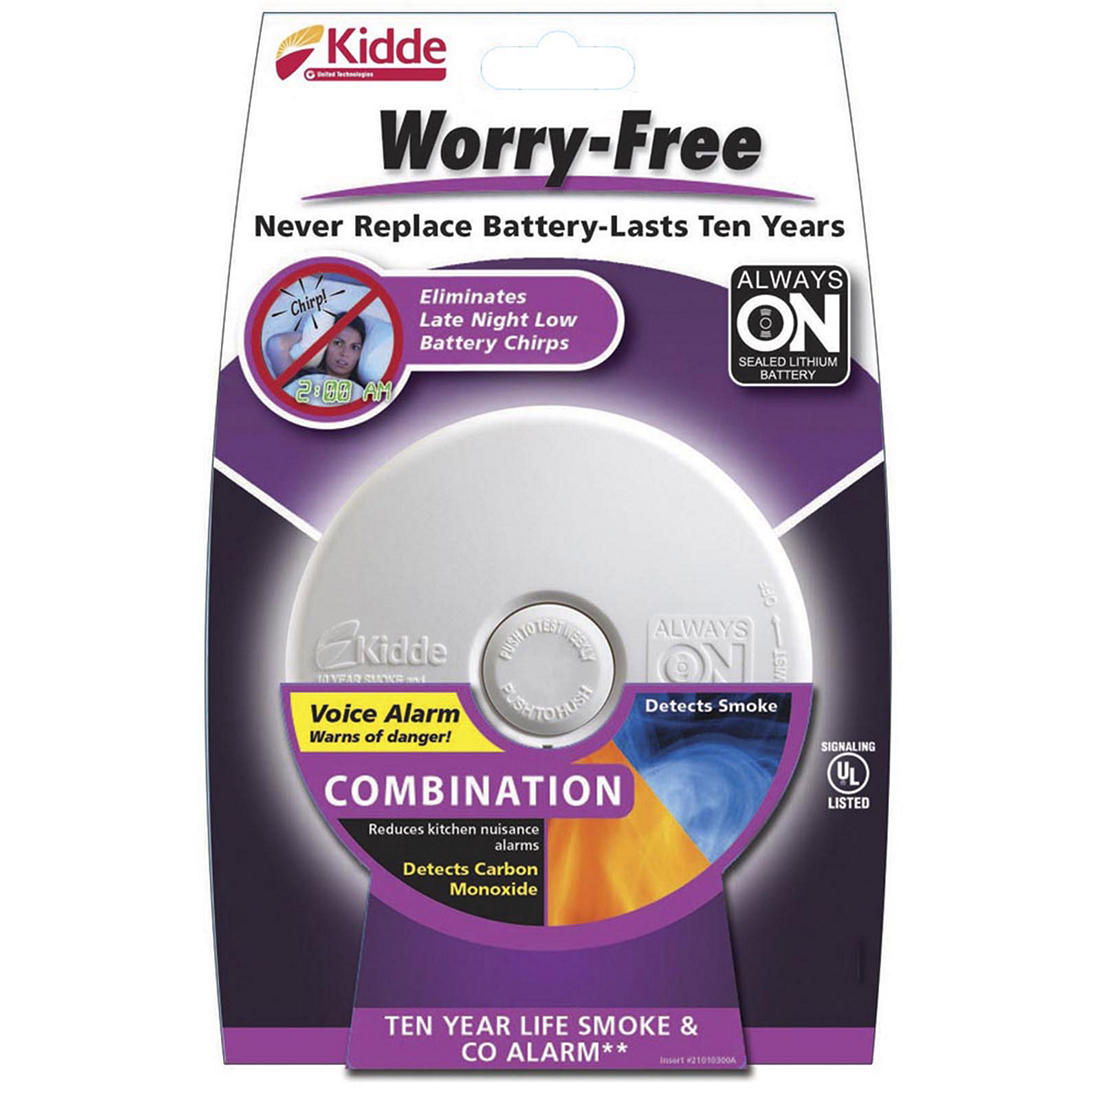 Kidde Worry Free Battery Powered Smoke And Carbon Monoxide Alarm